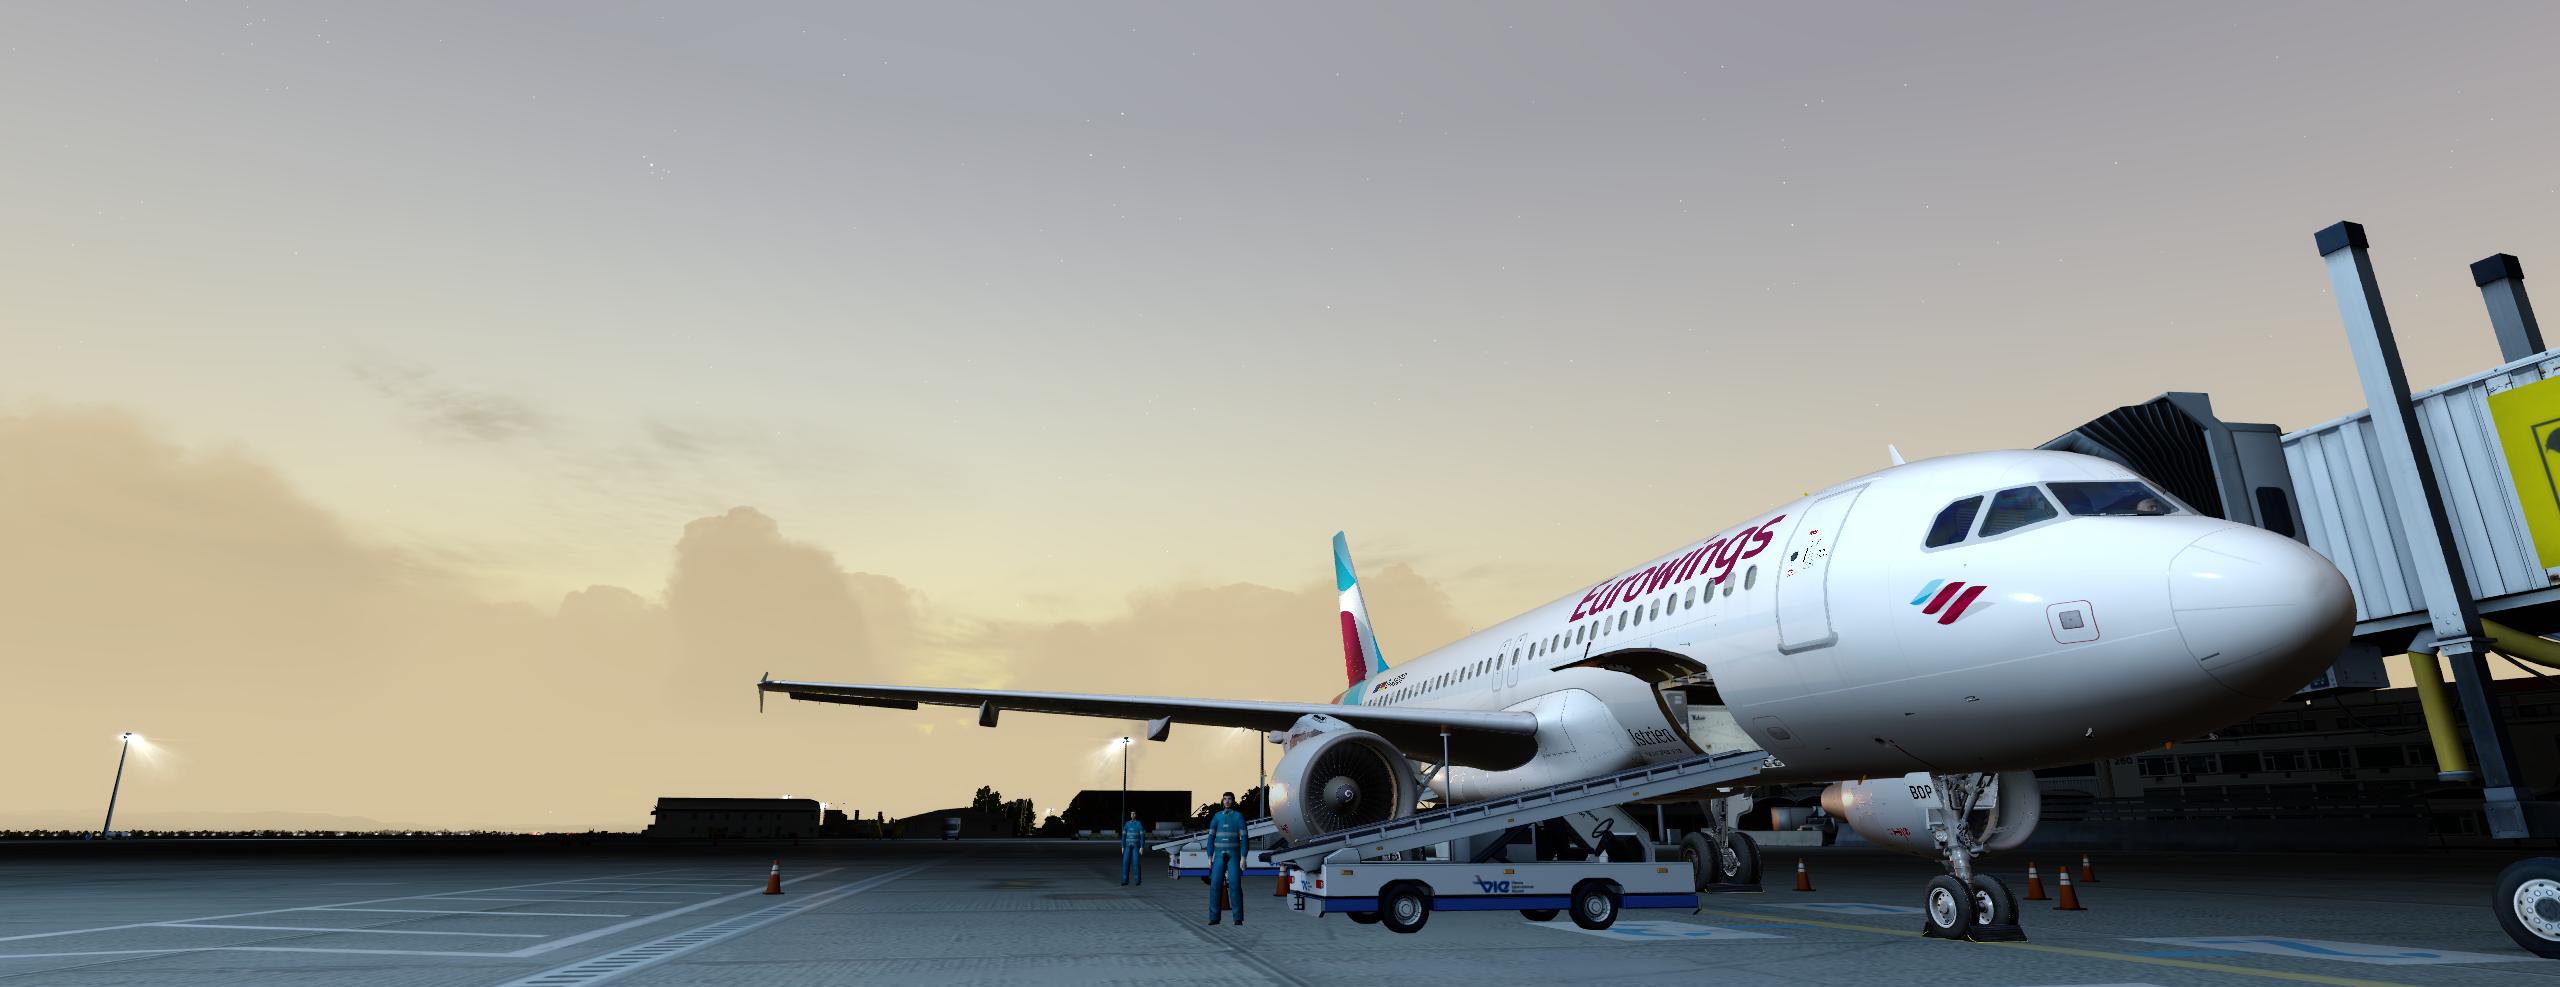 The perfect mix! - Screenshots - Flight Sim Labs Forums